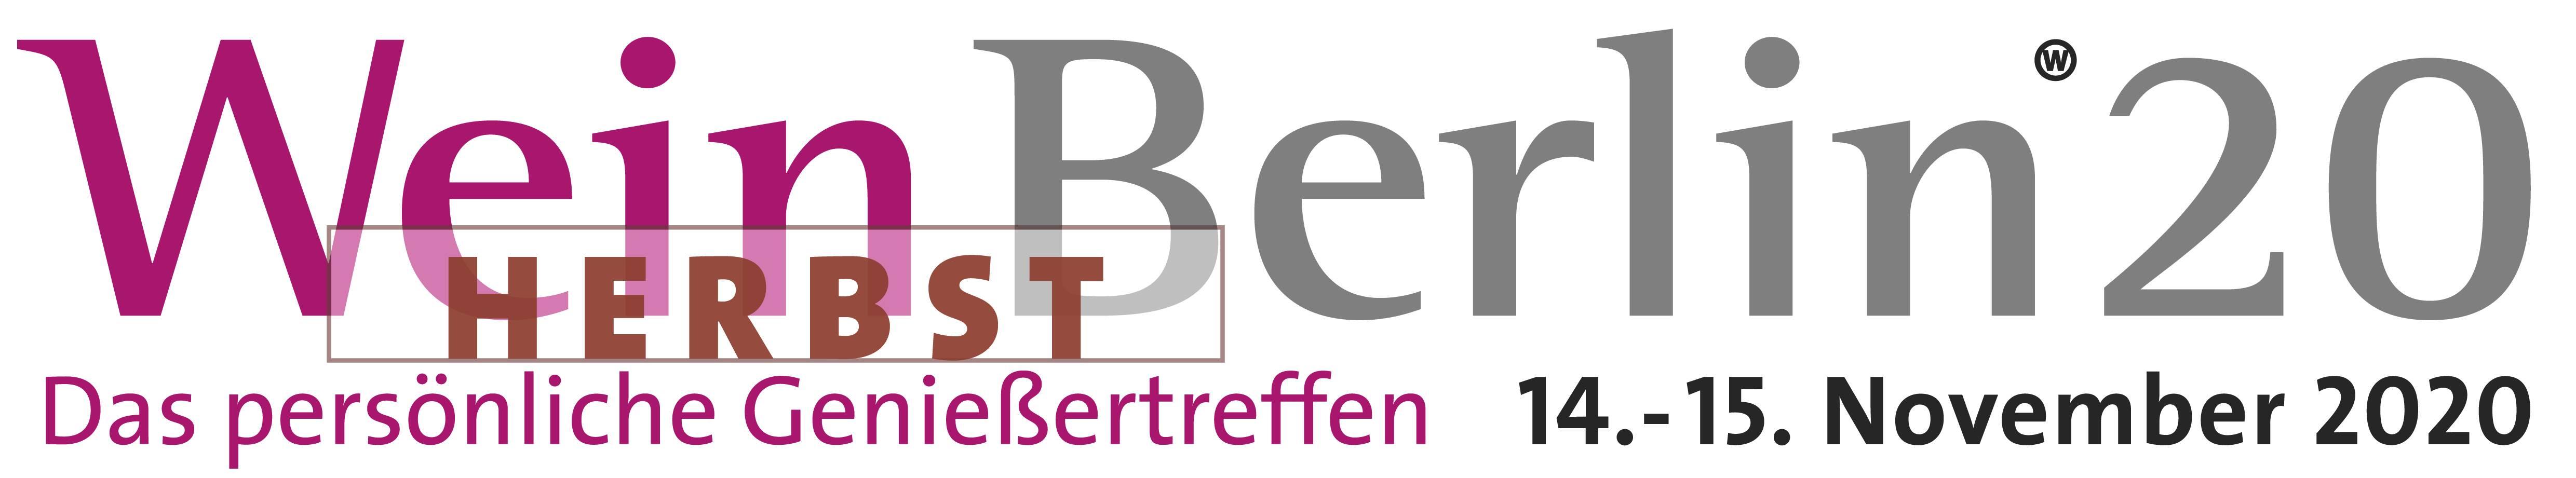 WeinBerlin Logo